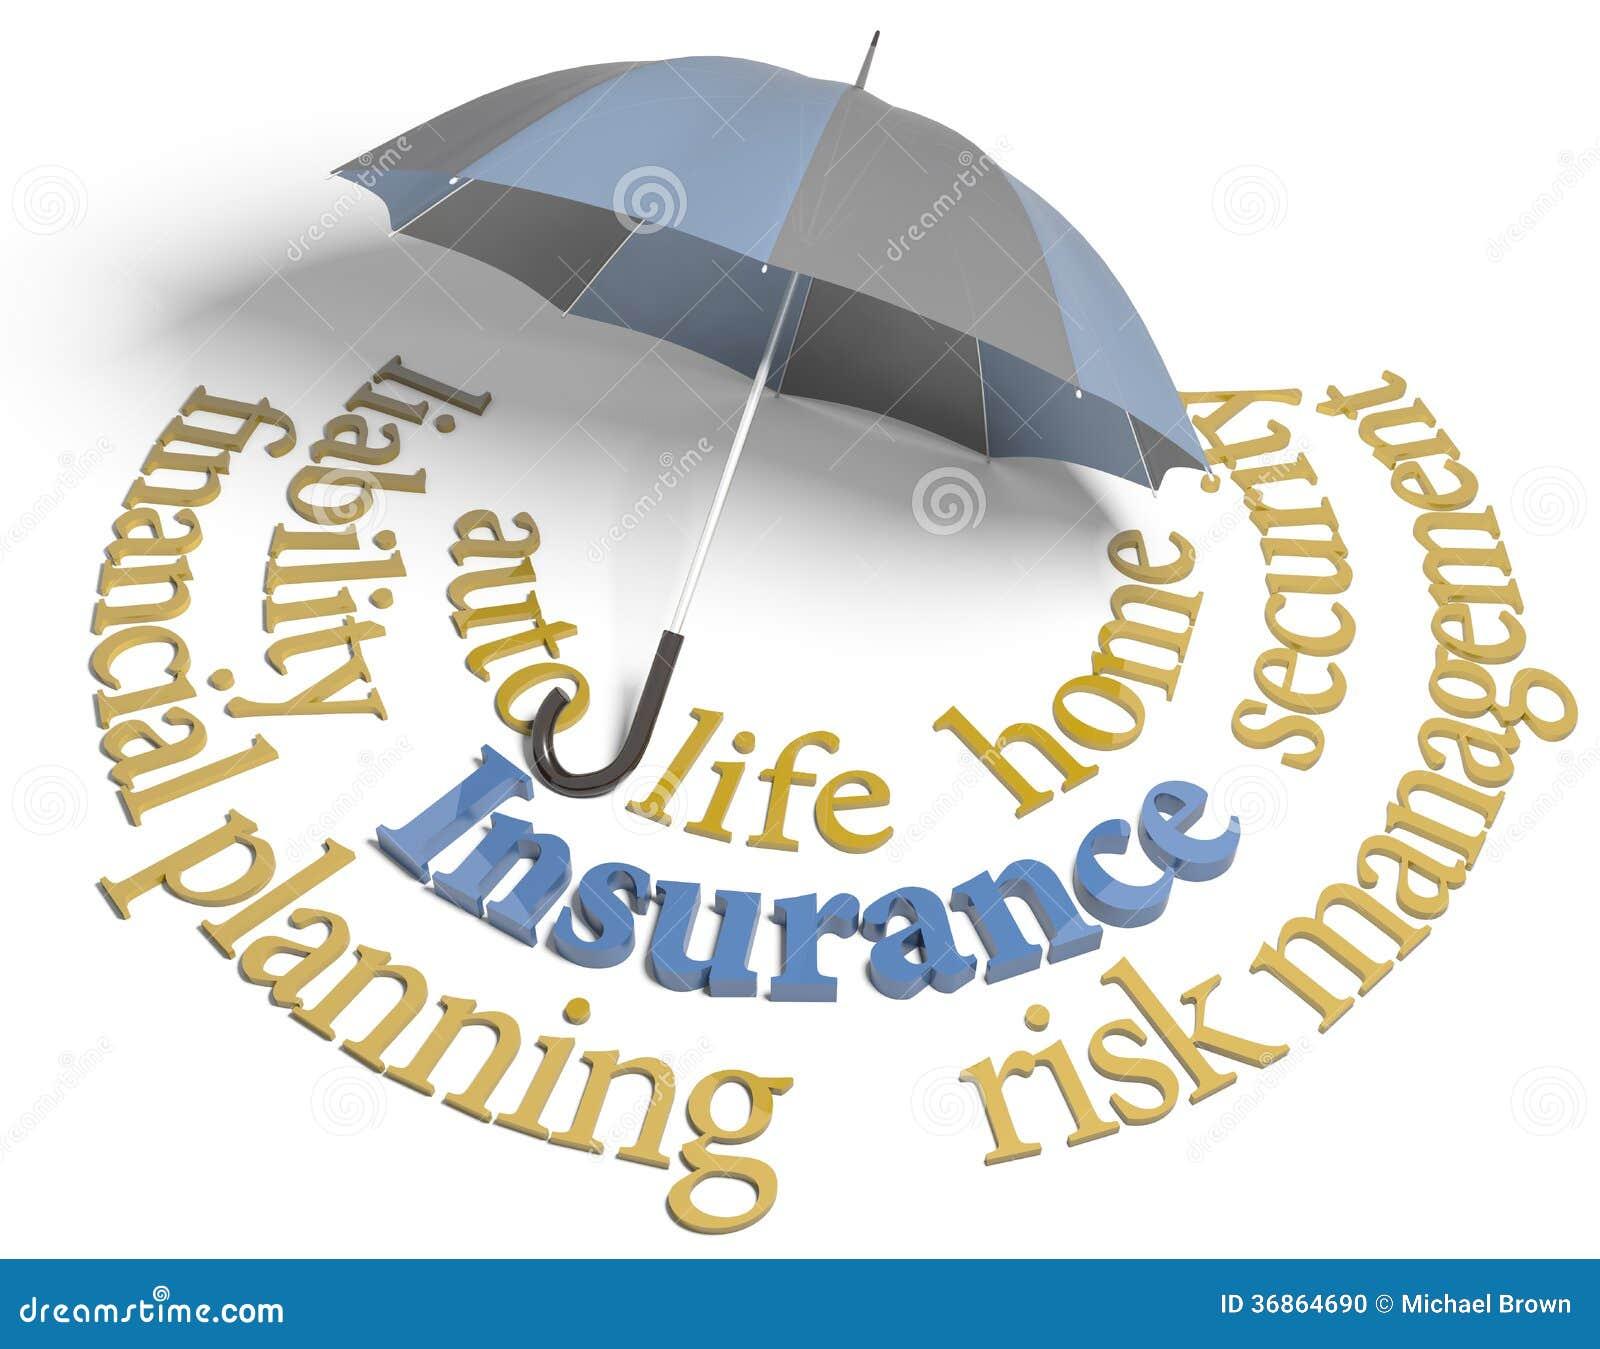 Commercial Auto Insurance Commercial Auto Insurance Vehicle Symbols